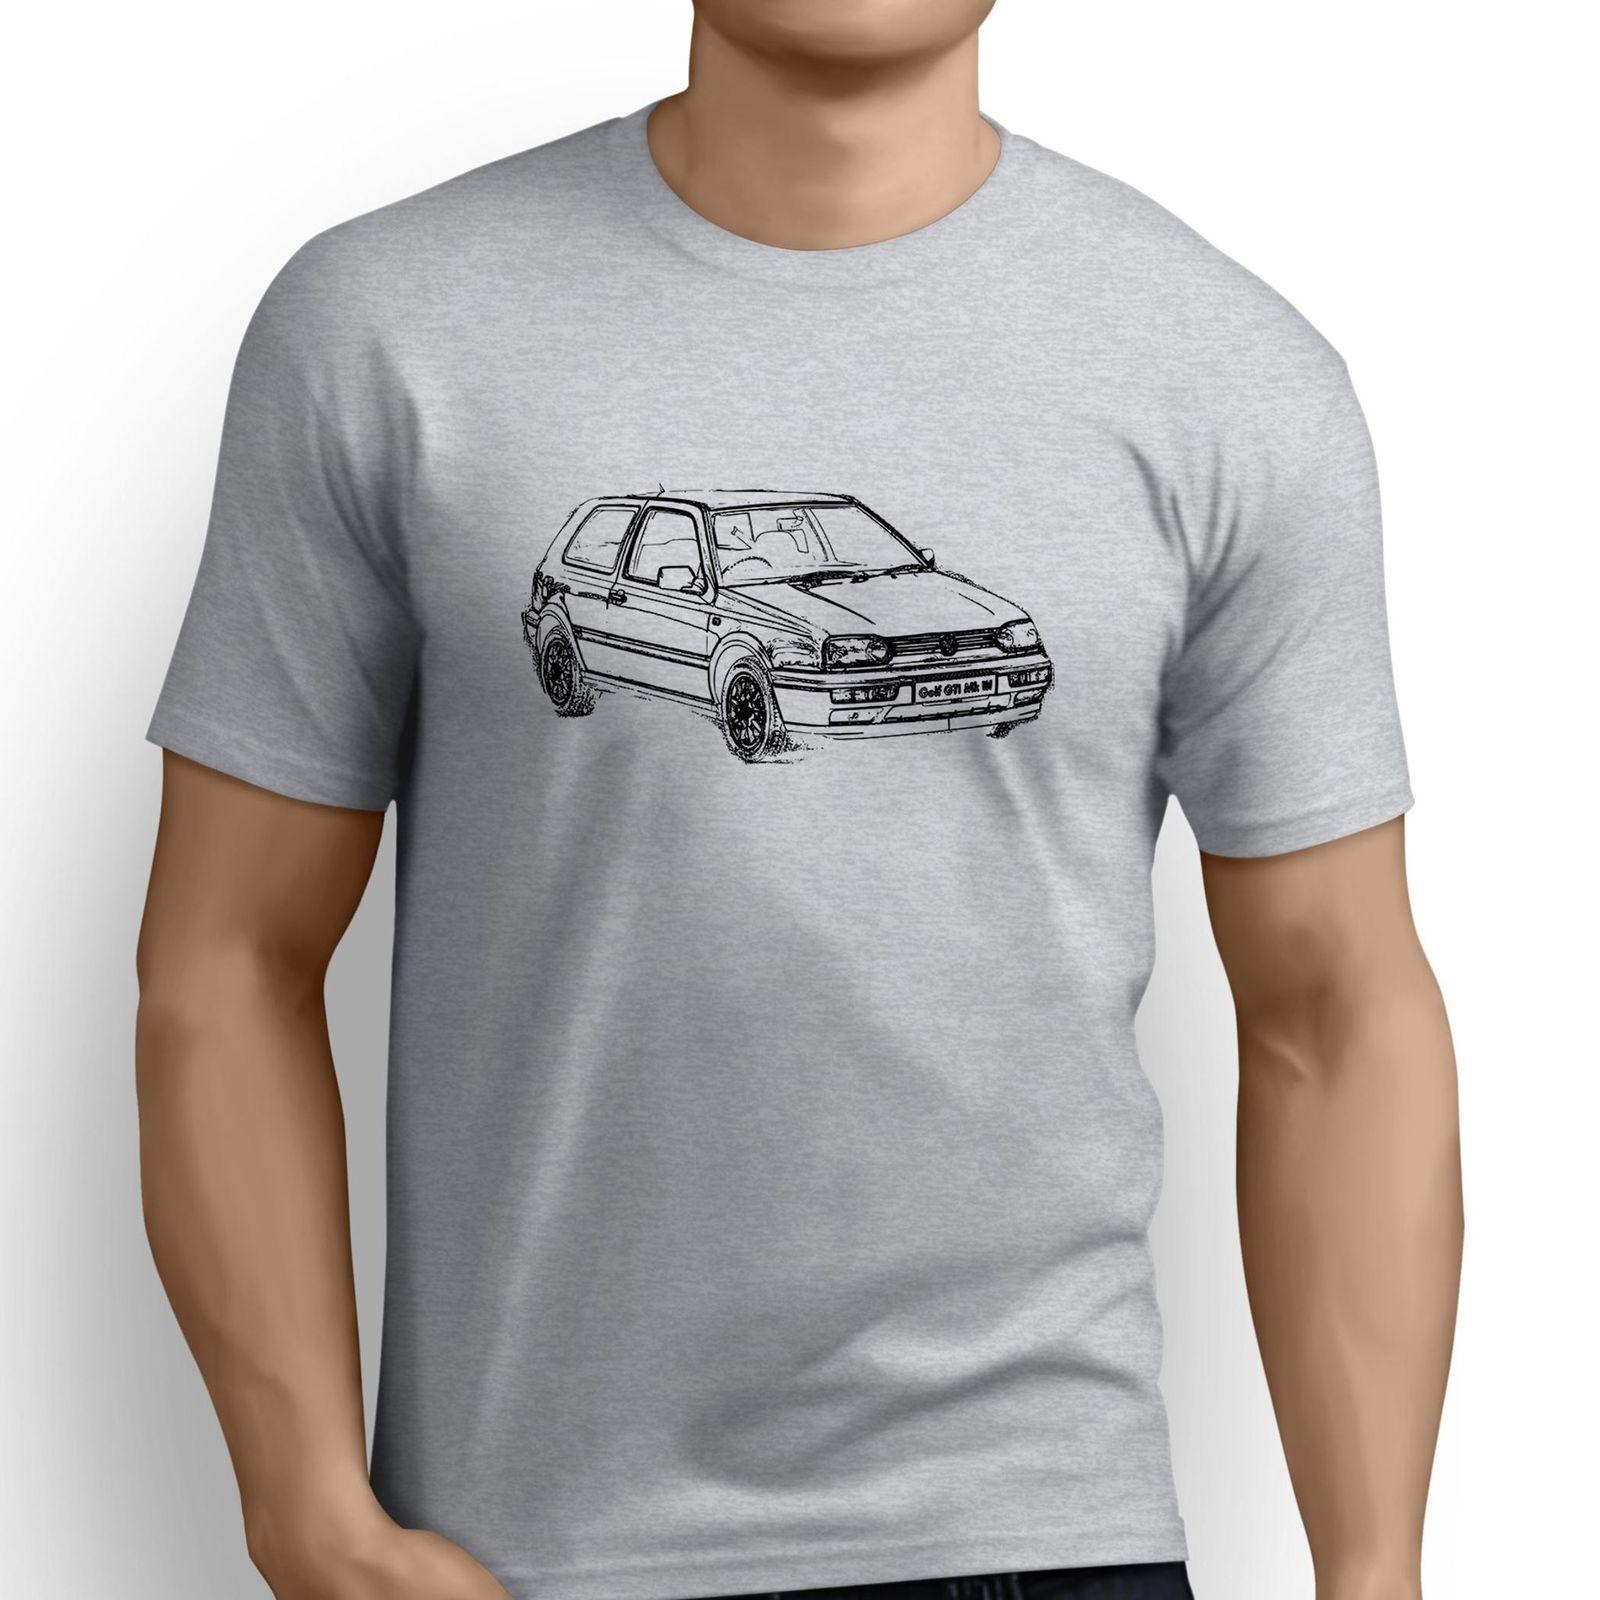 2018 Hot Sale Fashion Summer Casual Man T Shirt Good Quality  German Classic Car Fans Golfer Gti Mk3 Inspired Car custom Tee